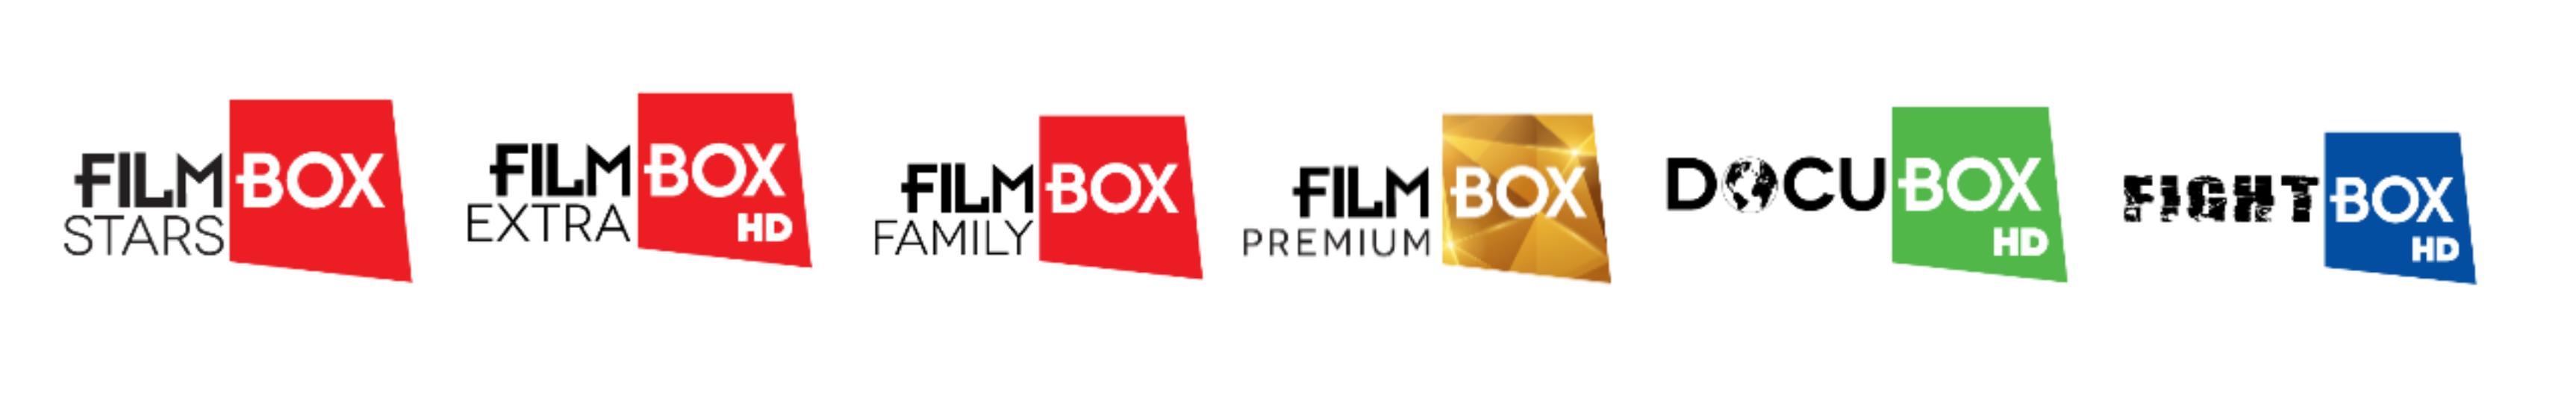 Filmbox Live csatornák